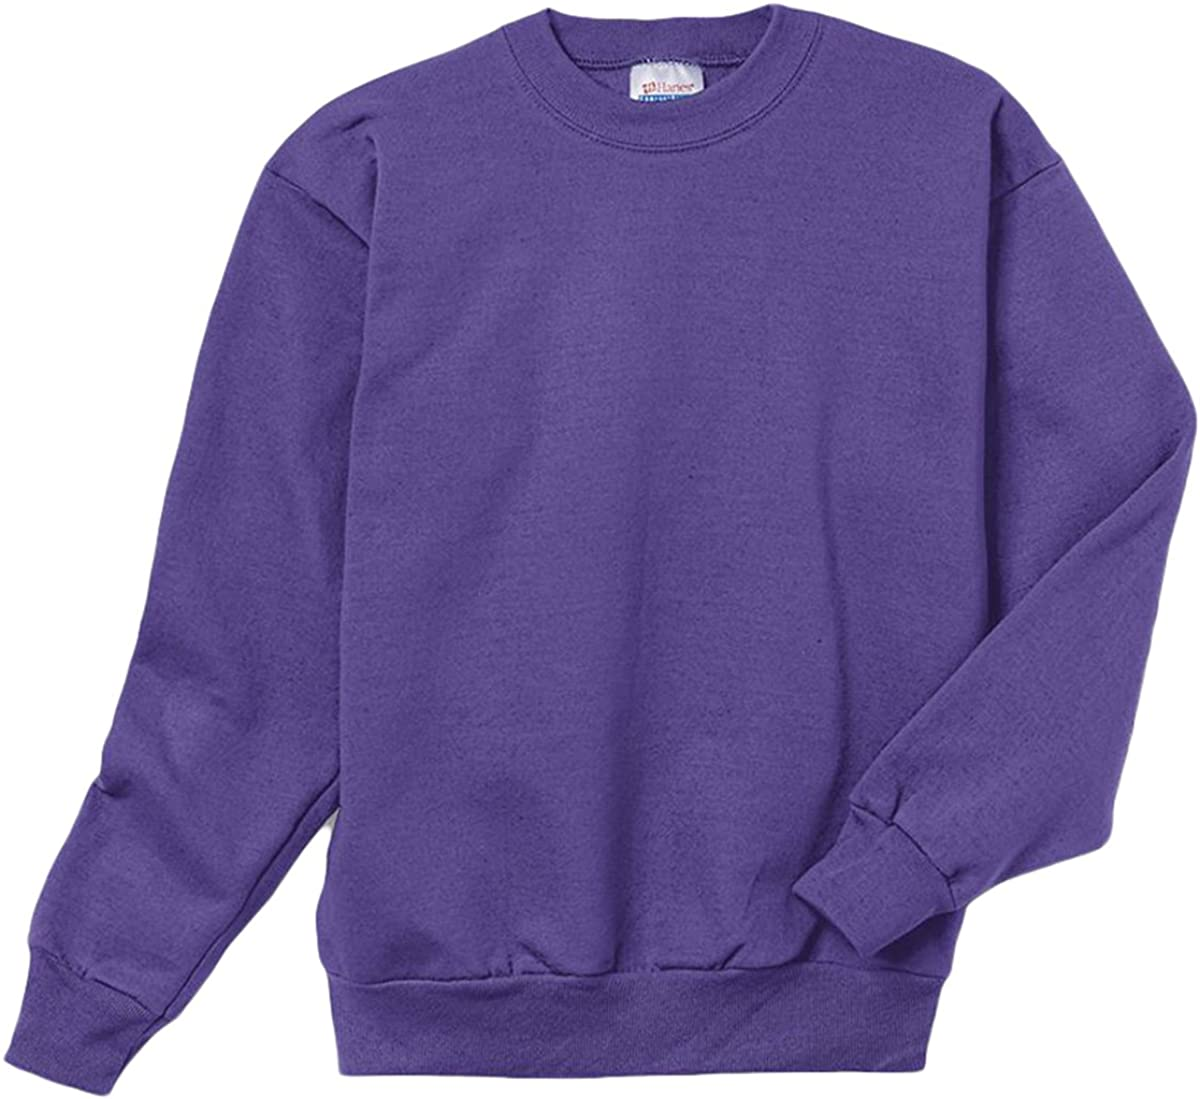 Hanes 7.8 oz Youth ComfortBlend EcoSmart Fleece Crew: Clothing